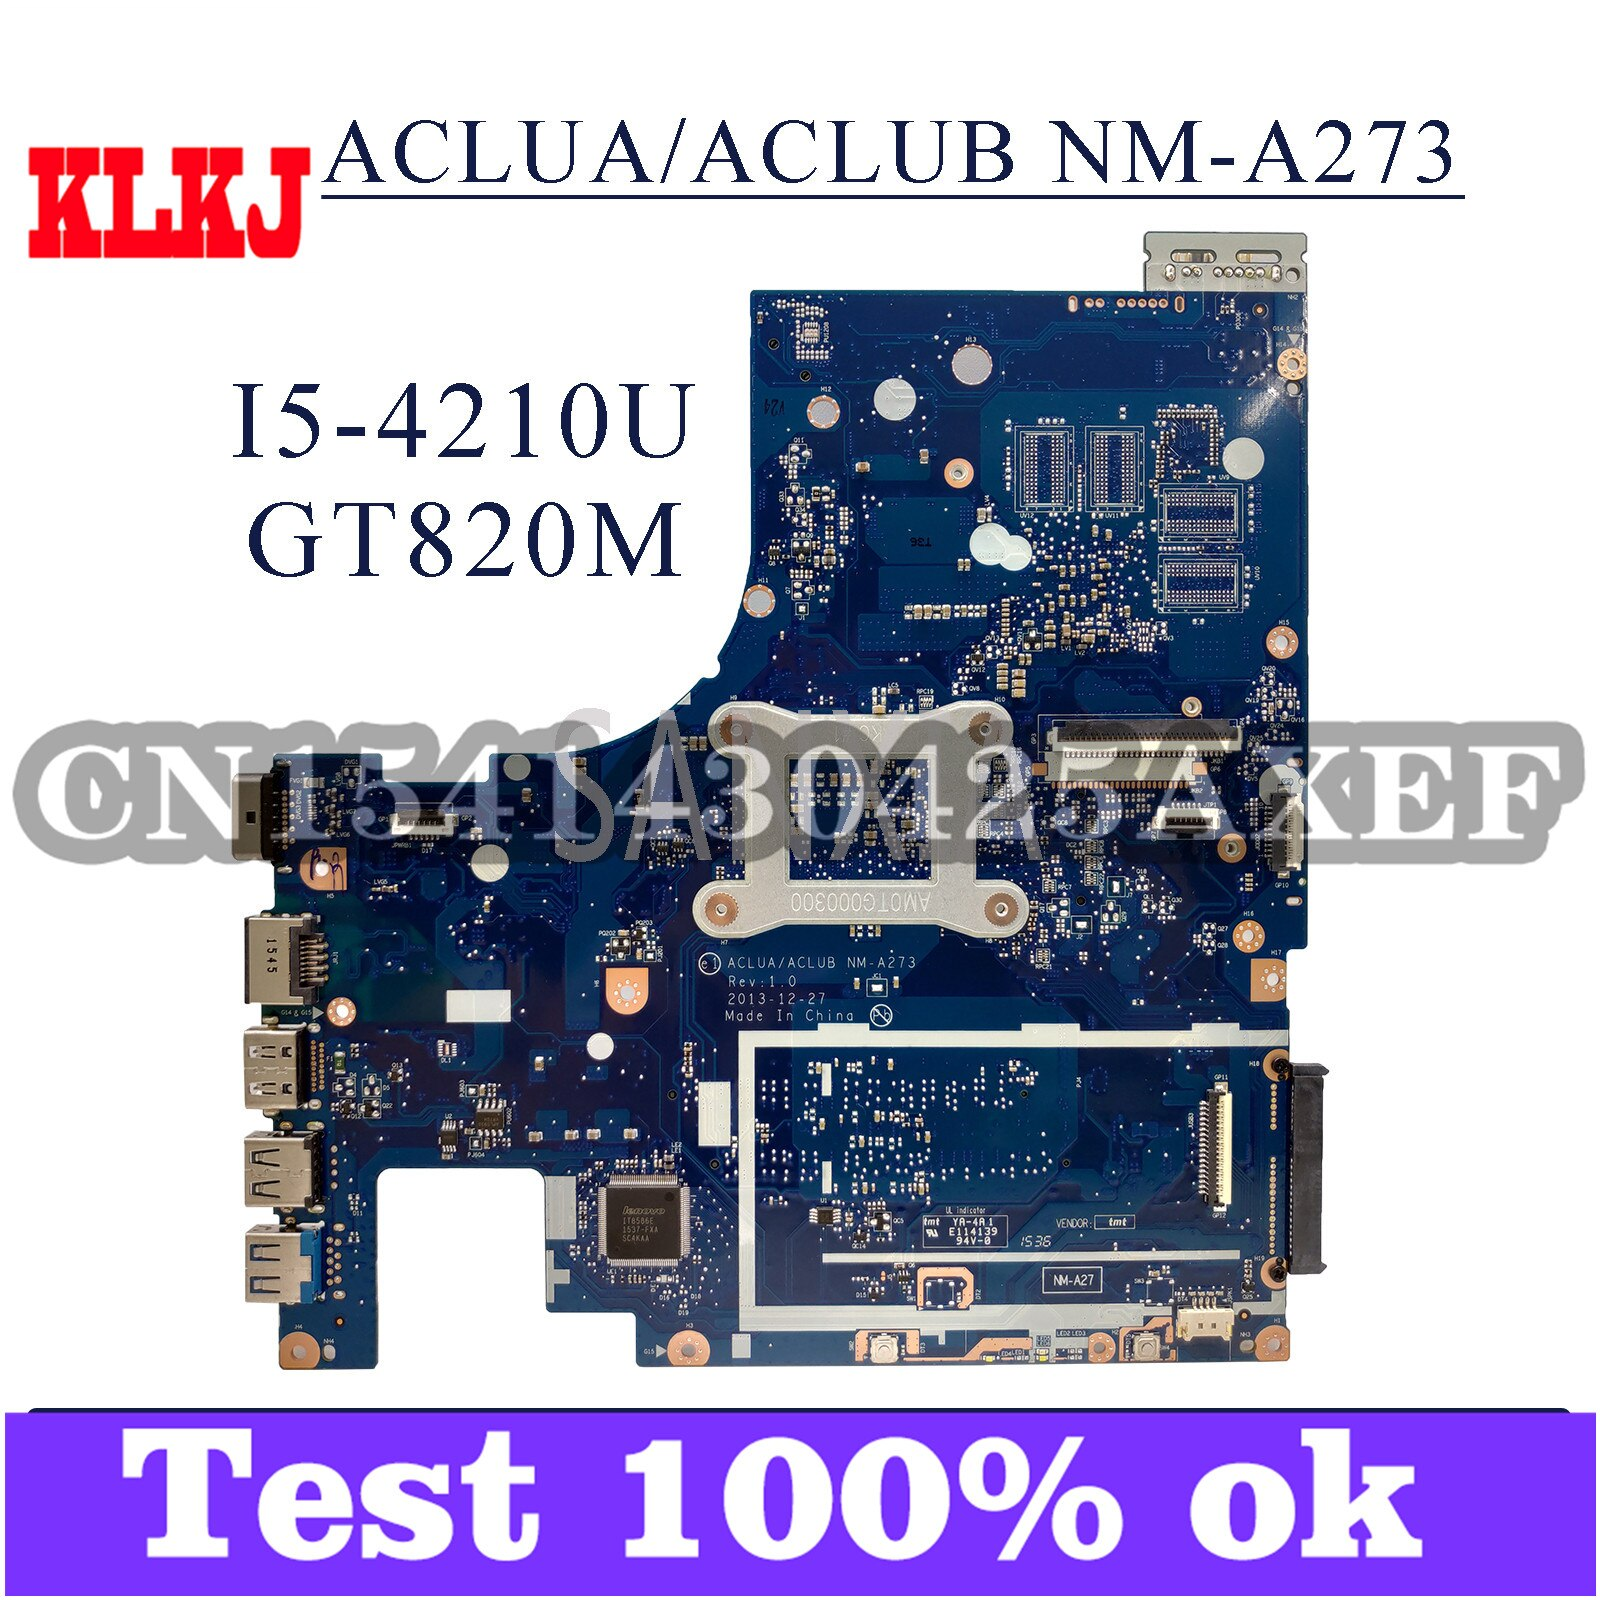 KLKJ NM-A273 اللوحة المحمول لينوفو G50-70M Z50-70 اللوحة الأصلية I5-4210U GT820M